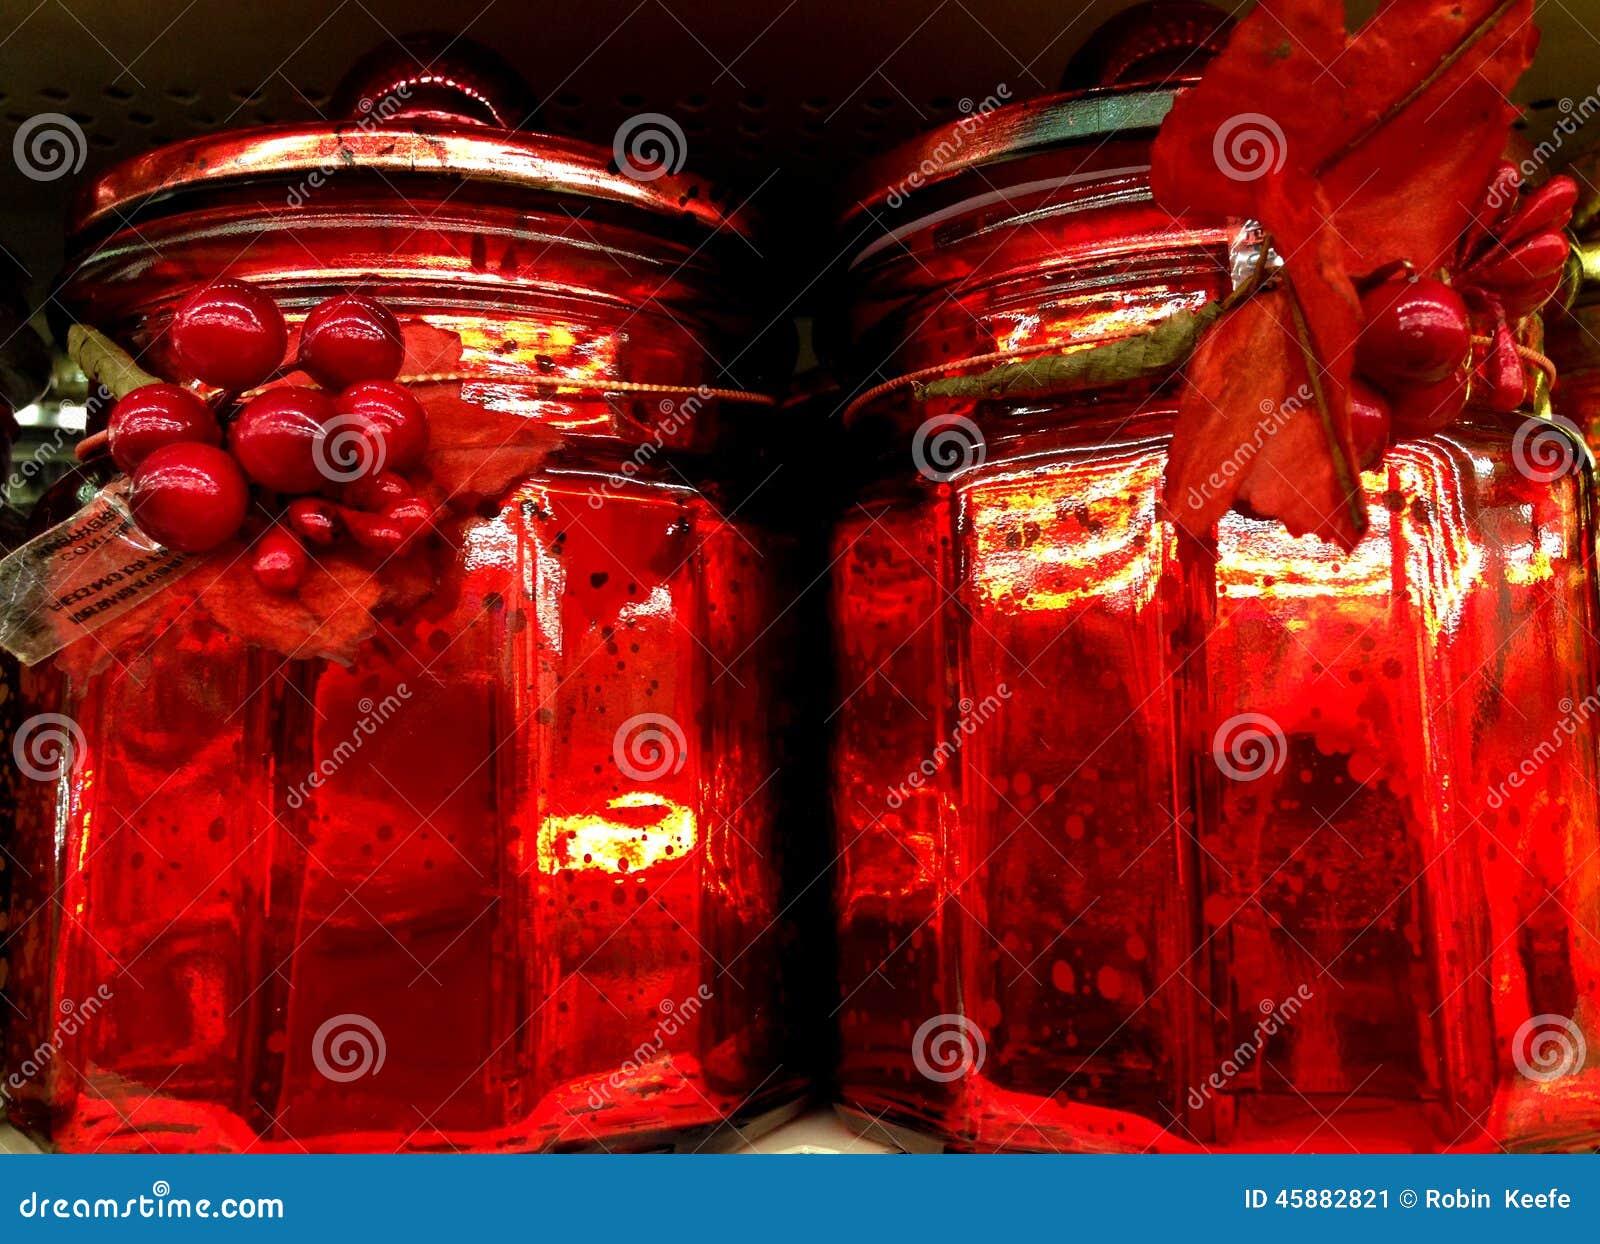 rote weihnachtsgl ser stockfoto bild 45882821. Black Bedroom Furniture Sets. Home Design Ideas